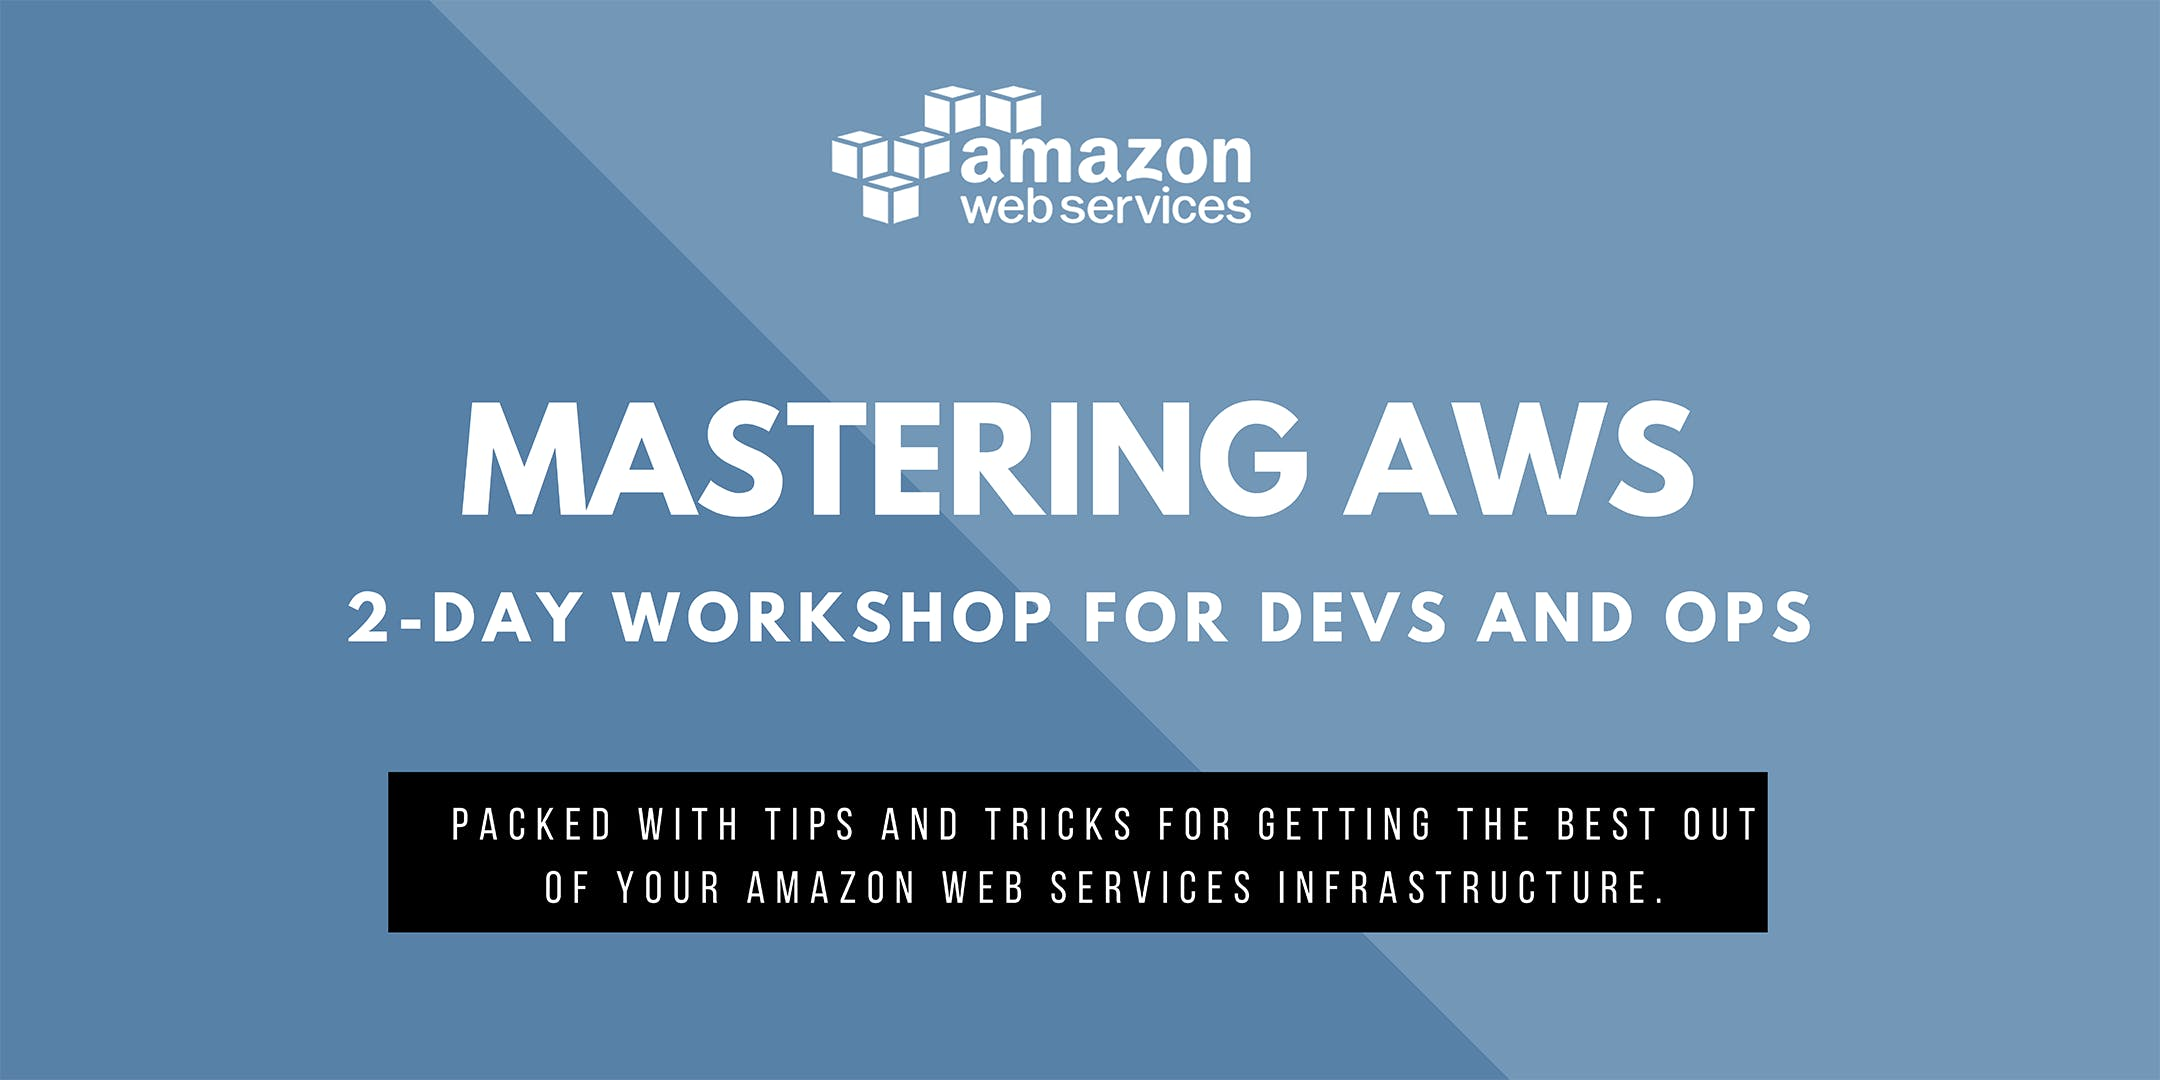 TOP Mastering Amazon Web Services (Liverpool)